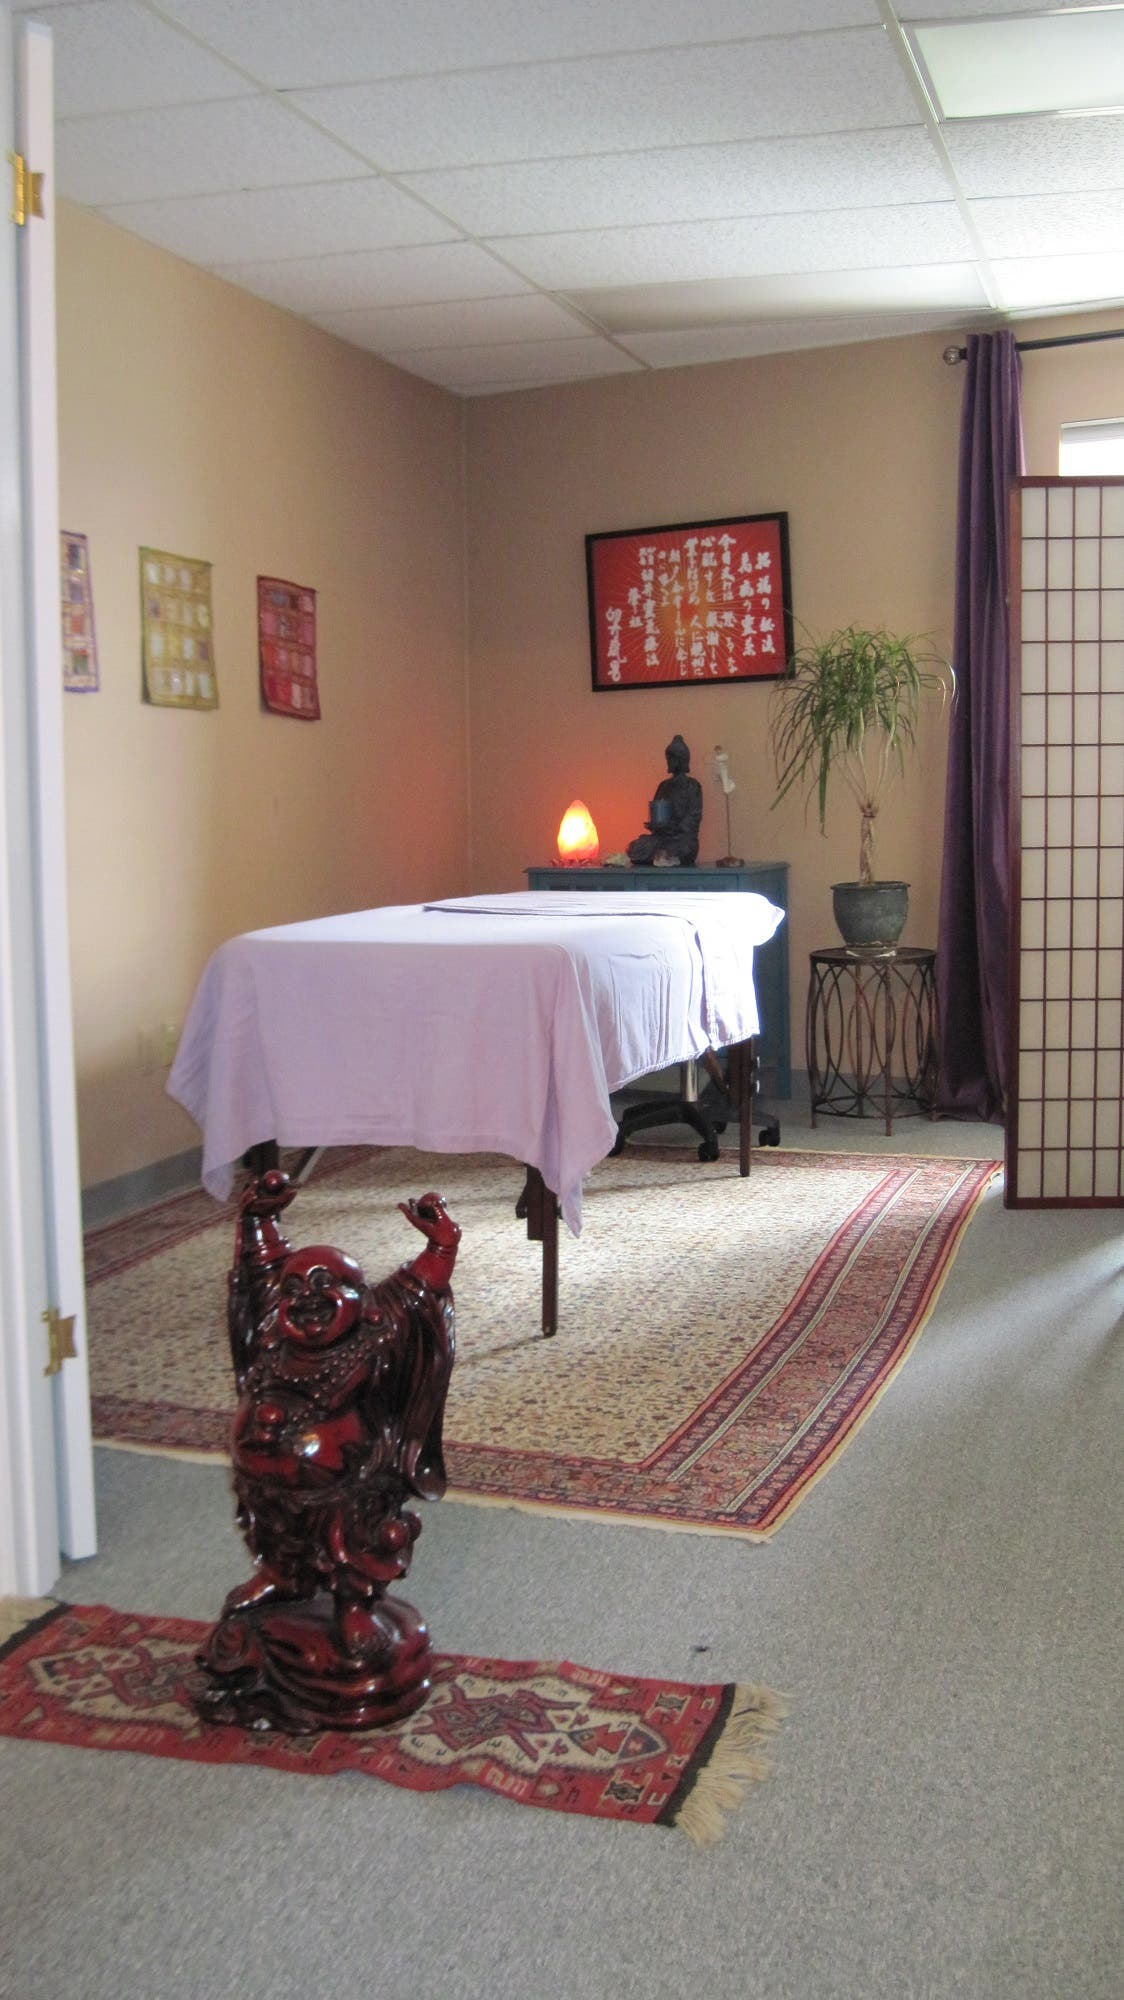 The Reiki Healing Center of New Jersey Opens in Wayne | Wayne, NJ Patch